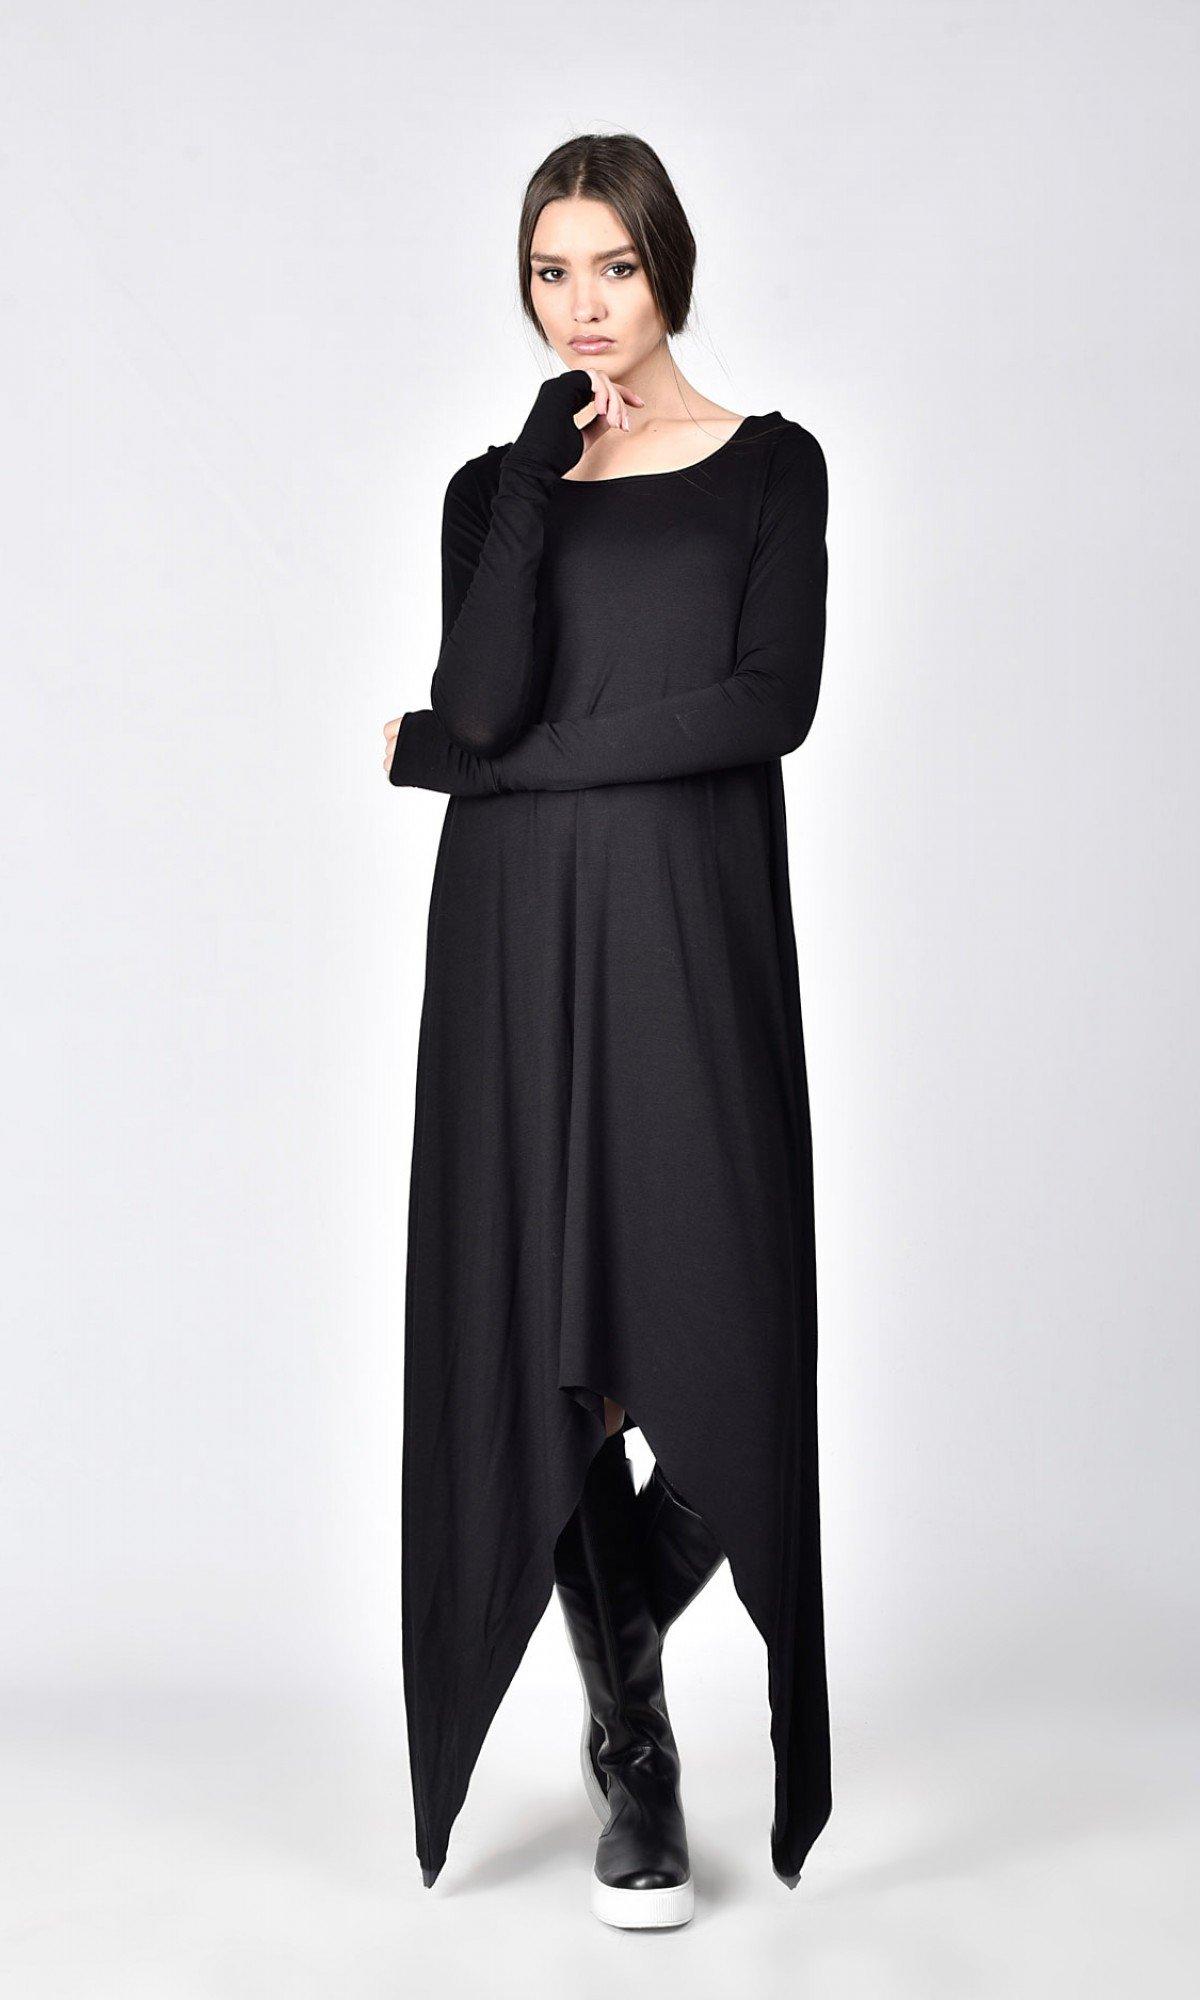 Black Loose Tunic Dress A03535